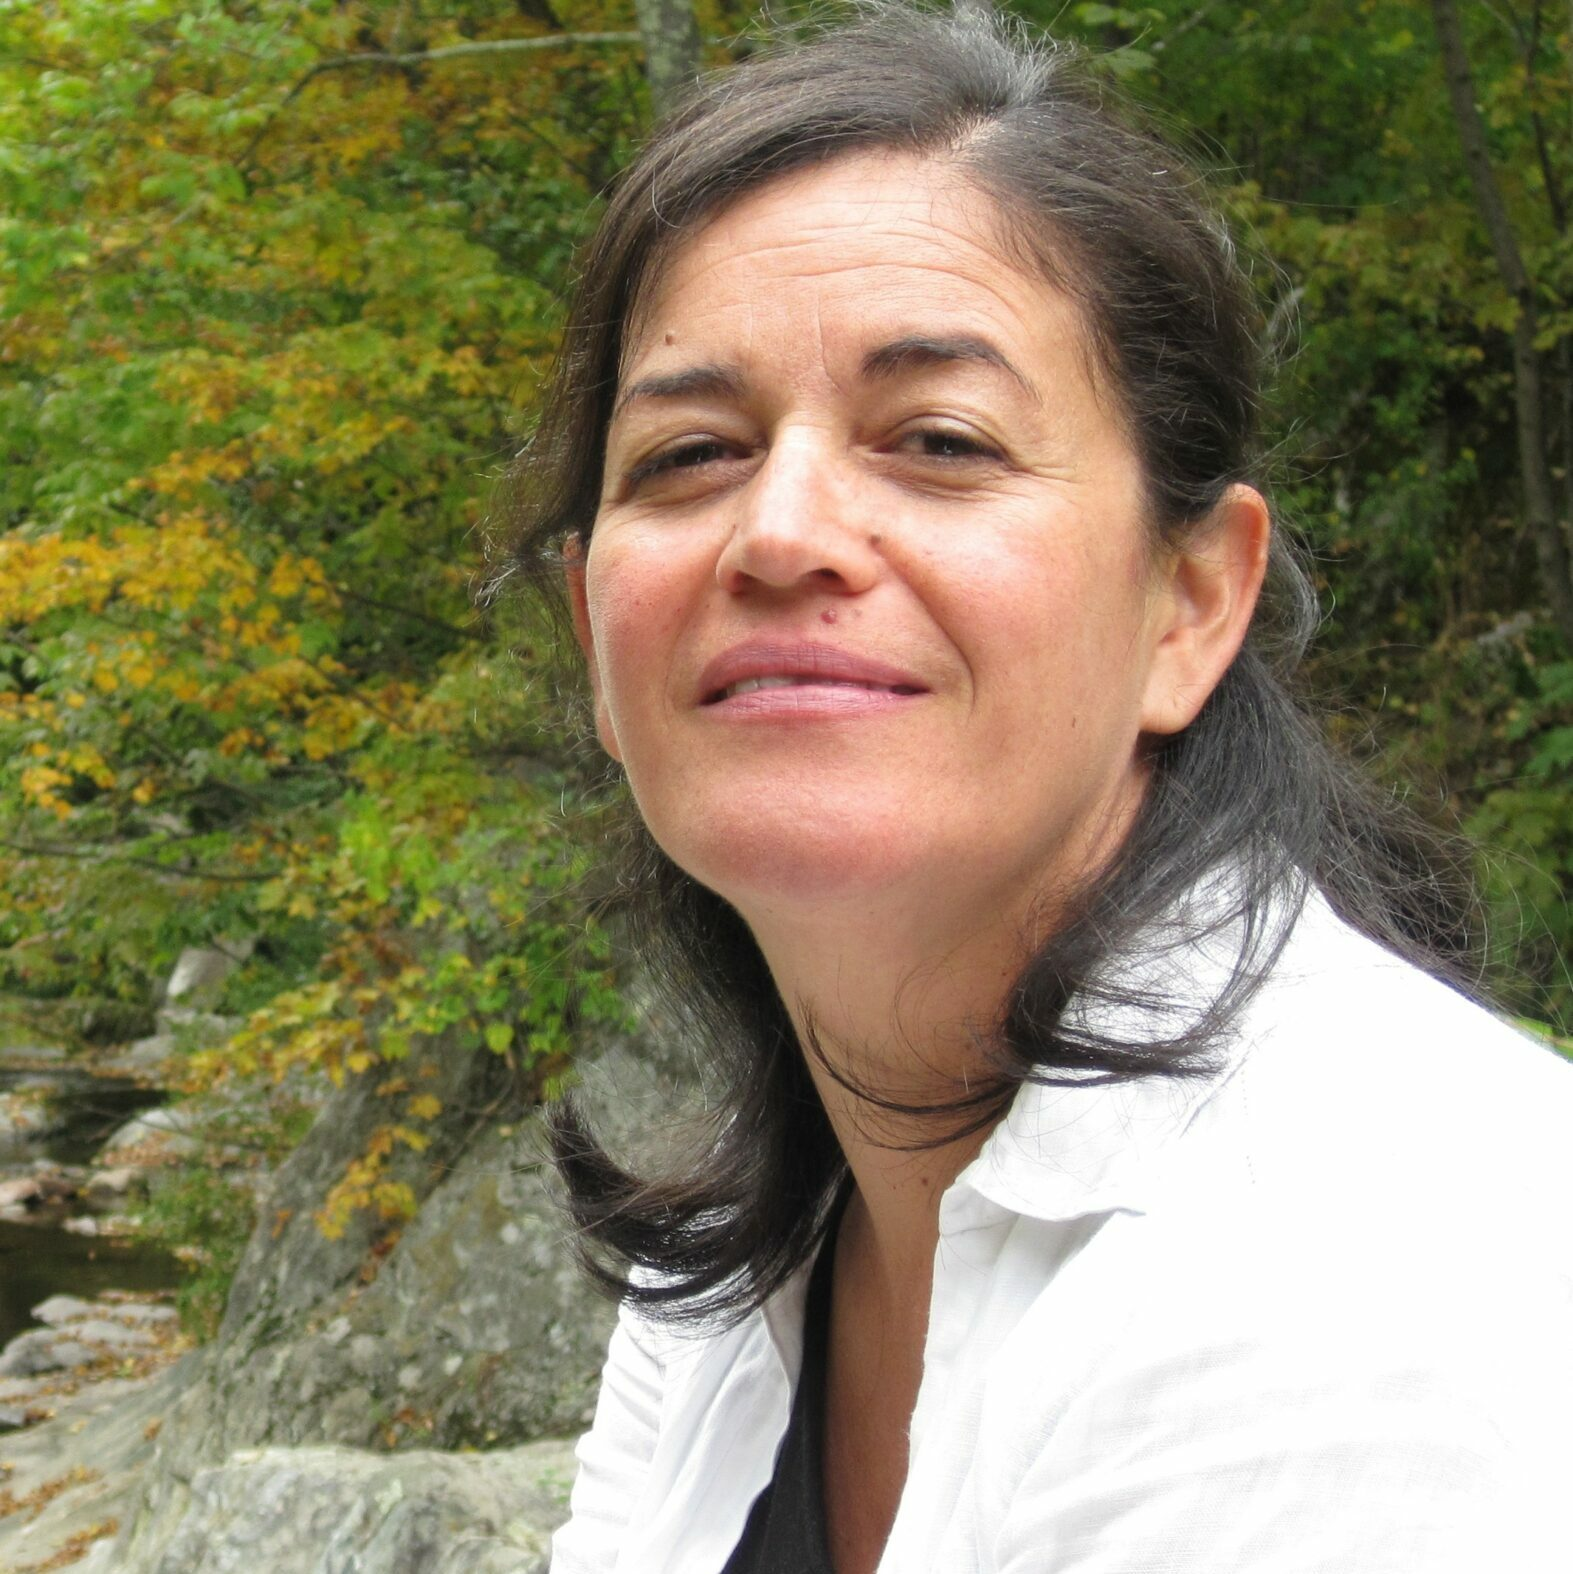 Raquel Peñalosa